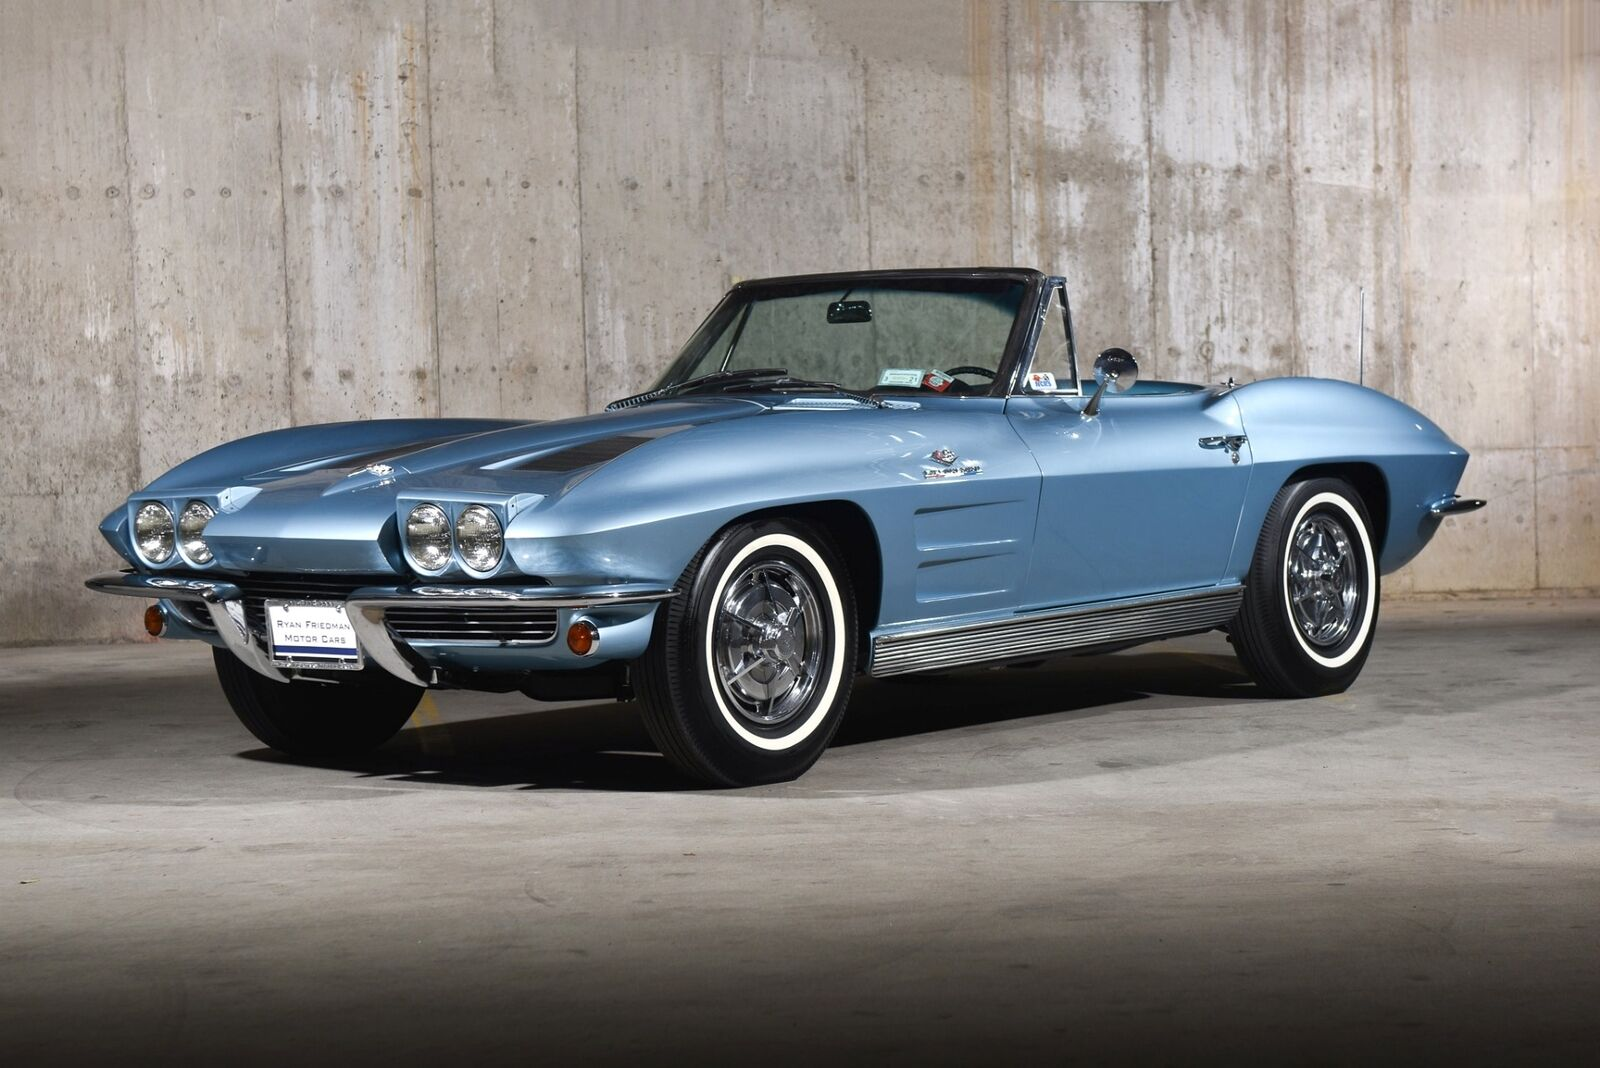 1963 Blue Chevrolet Corvette   | C2 Corvette Photo 5